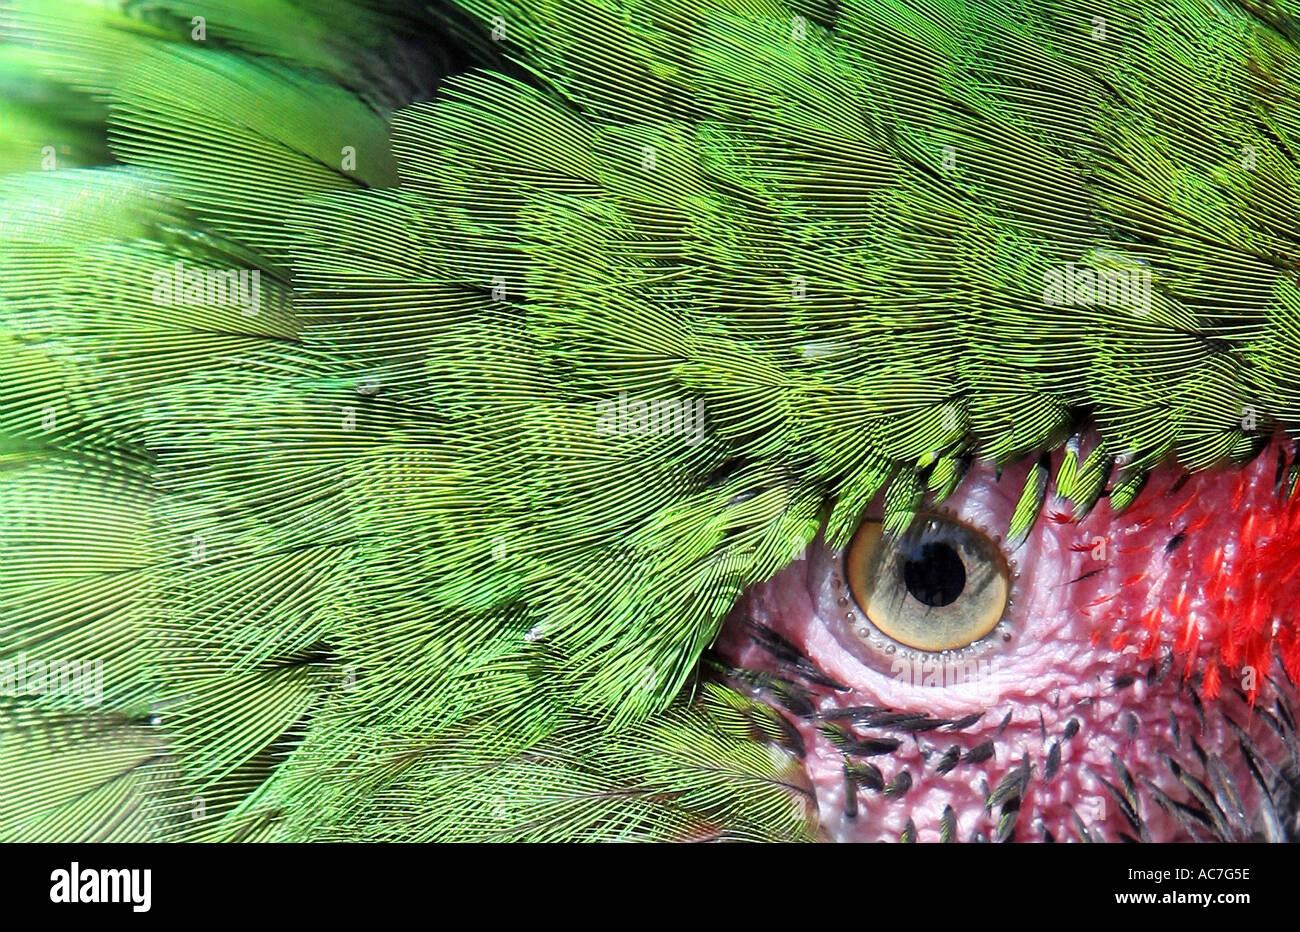 Green Parrots eye very close